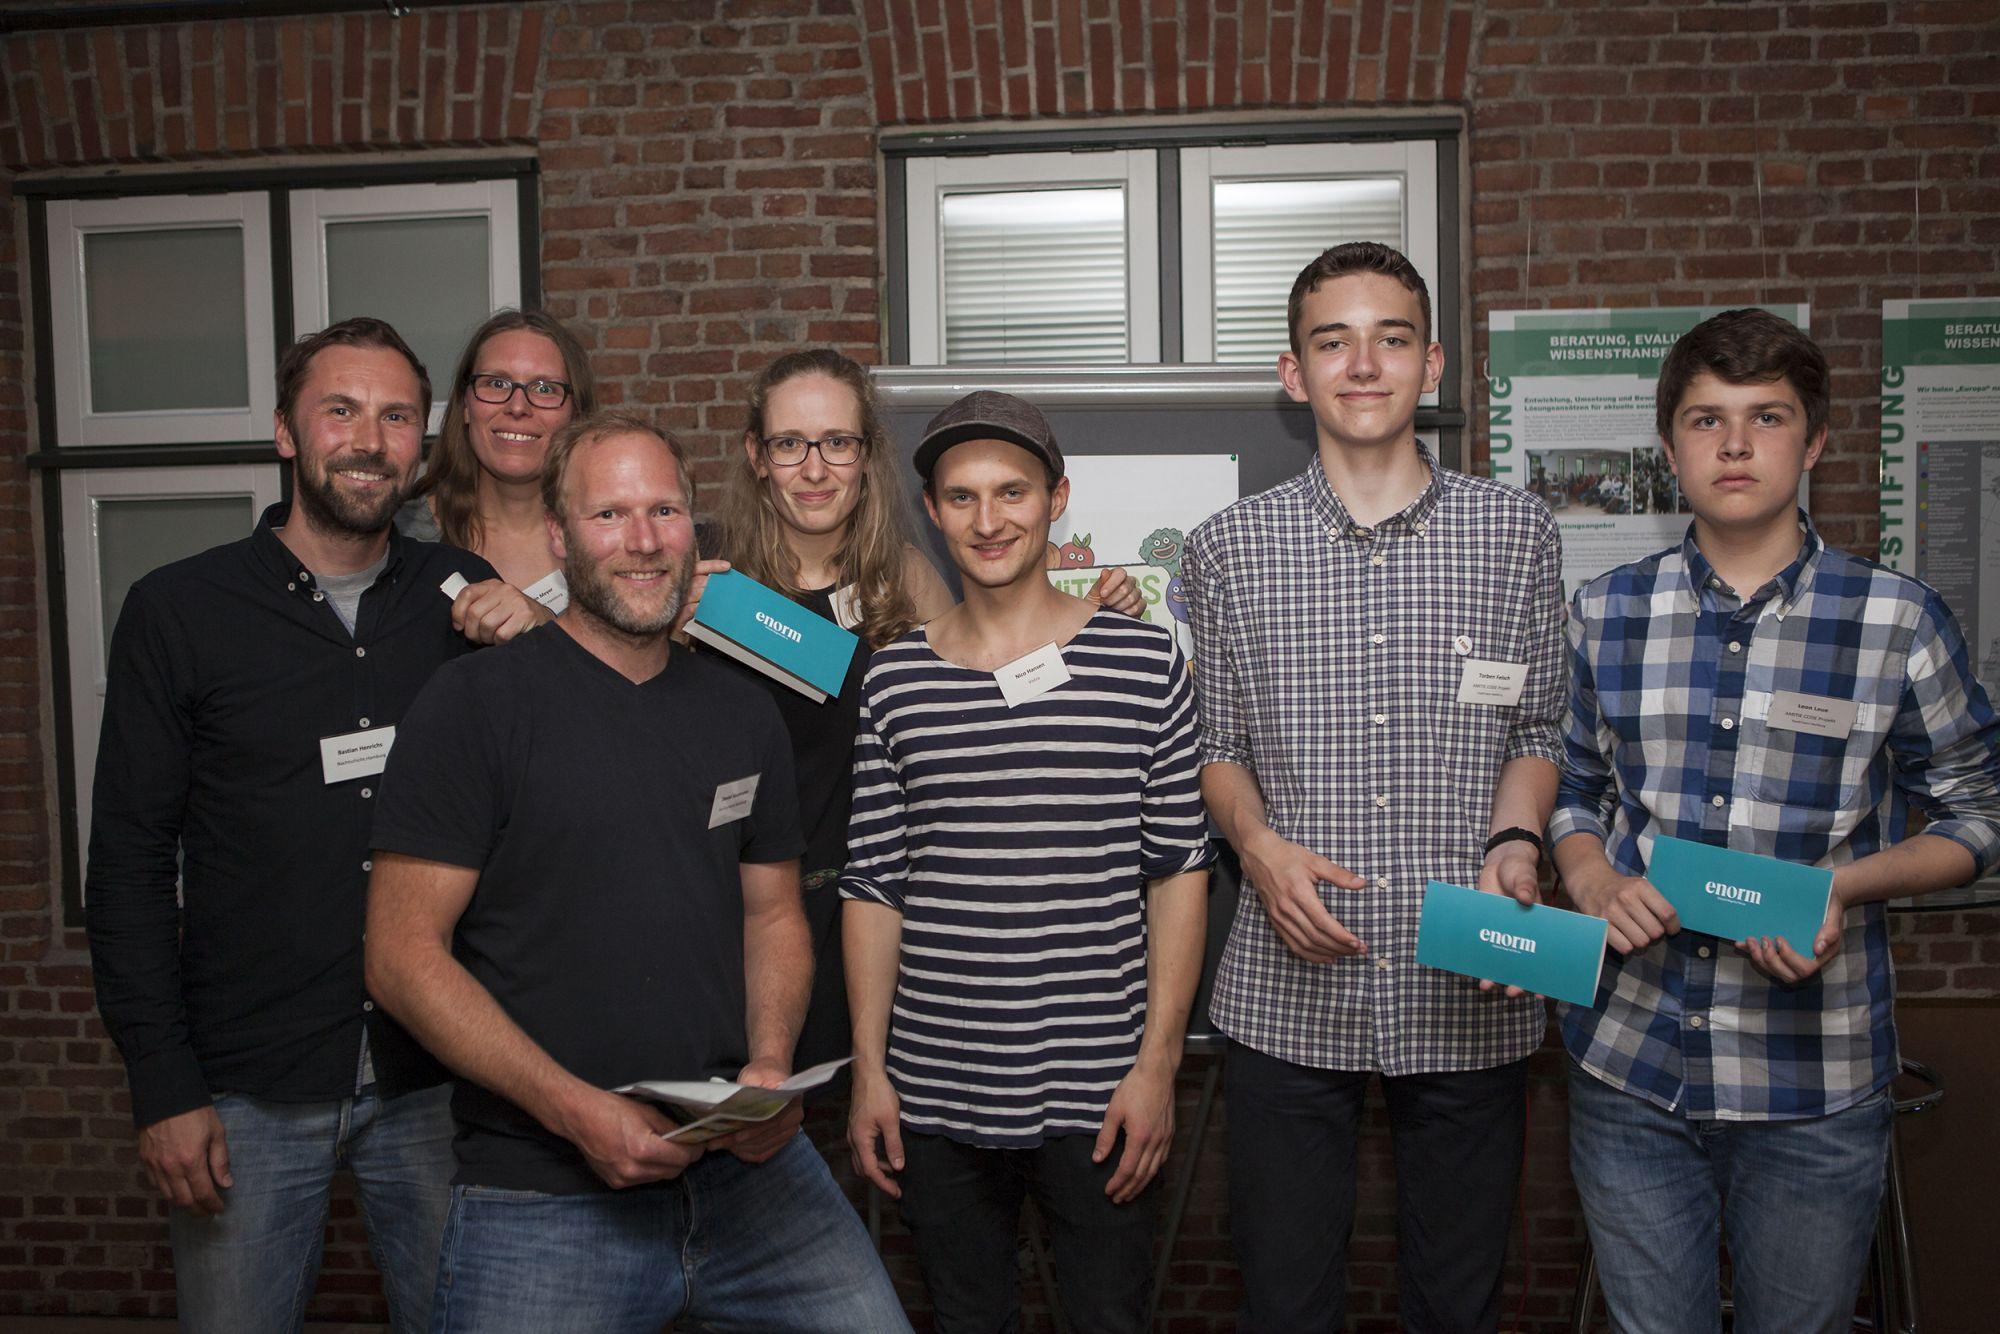 100 Sekunden – 32. N Klub Hamburg, 28.06.2017 Lawaetz Stiftung